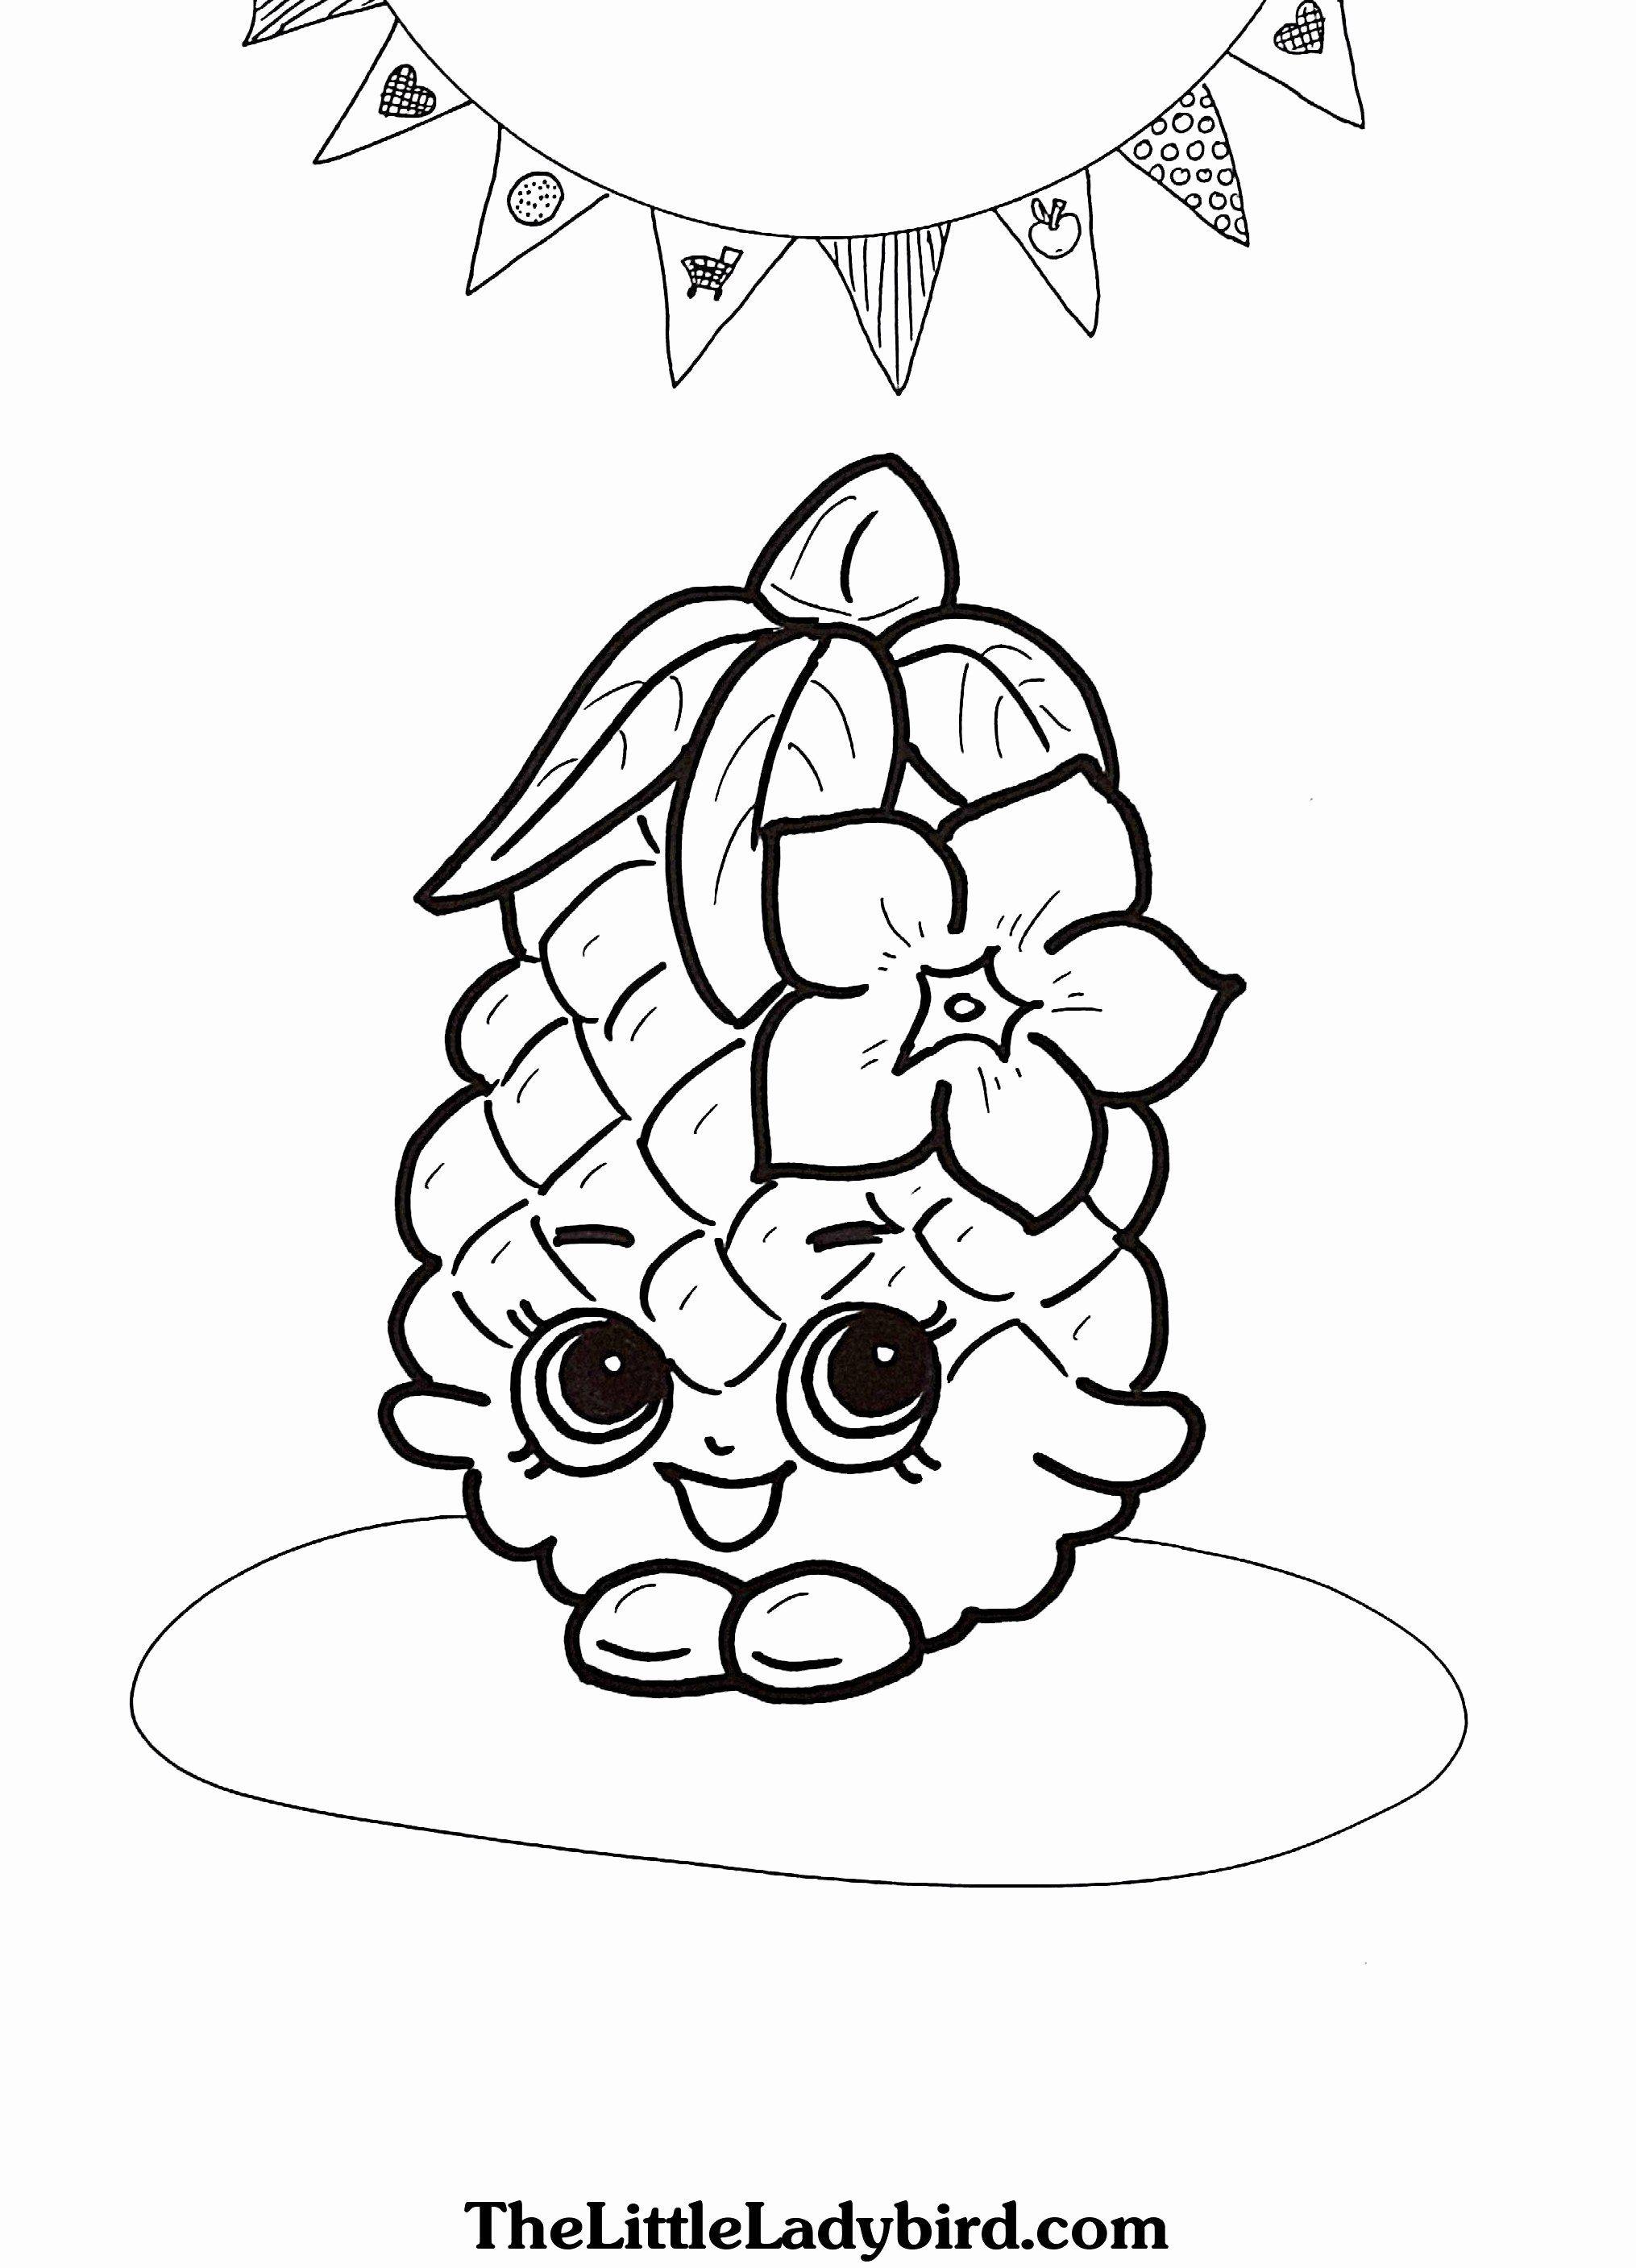 Disney Emoji Coloring Pages Beautiful Chuggington Coloring Pages Herbst Ausmalvorlagen Geburtstag Malvorlagen Malvorlagen Tiere